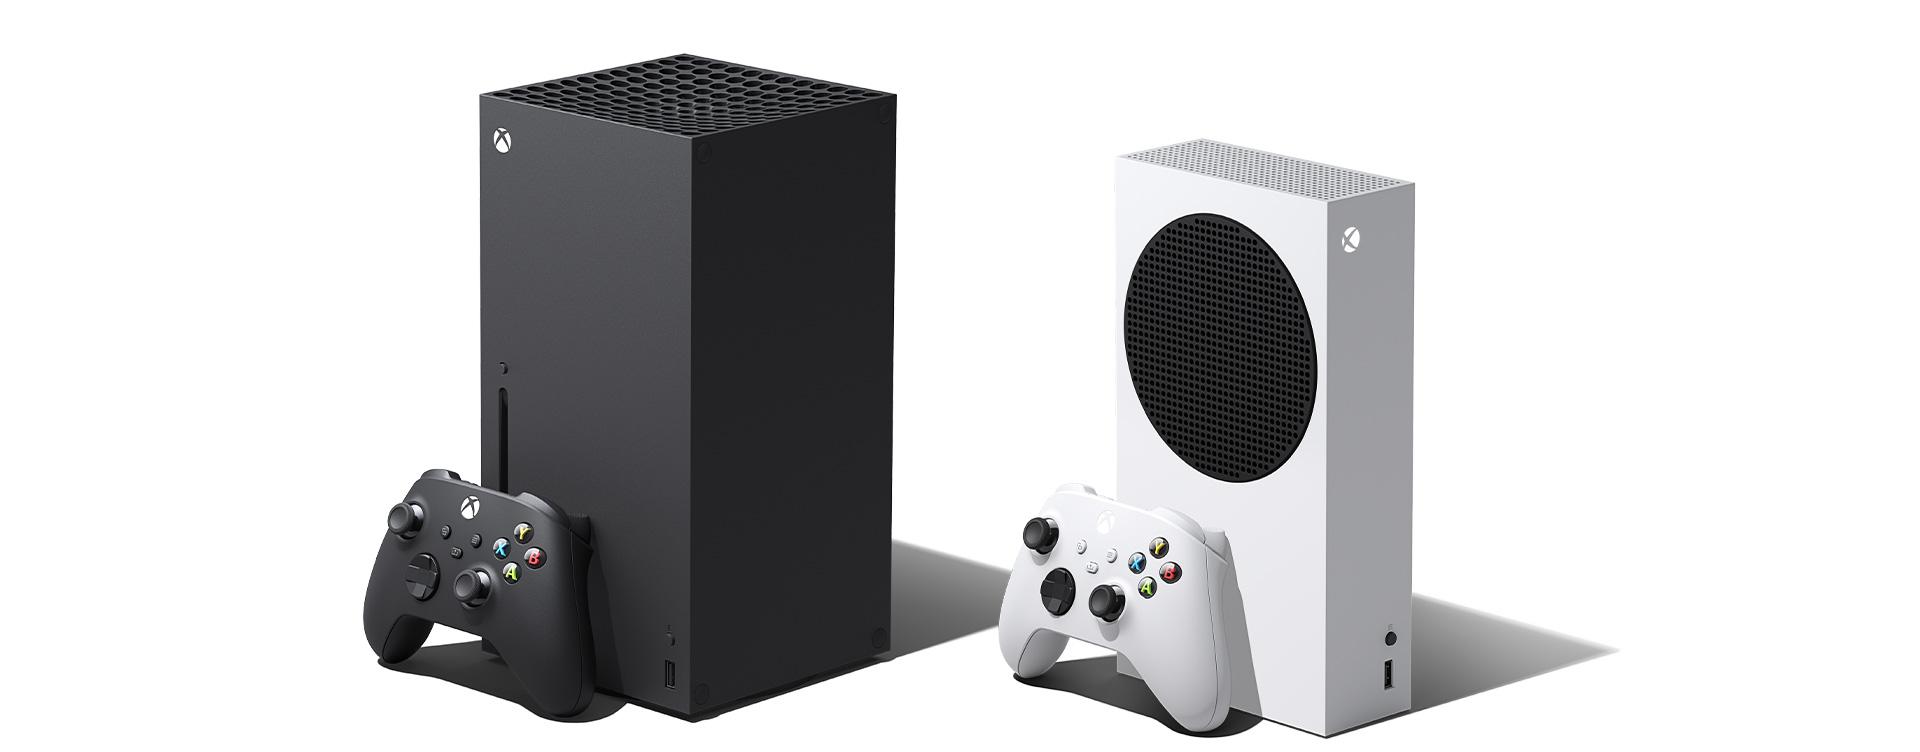 Xbox Series X and Xbox Series S